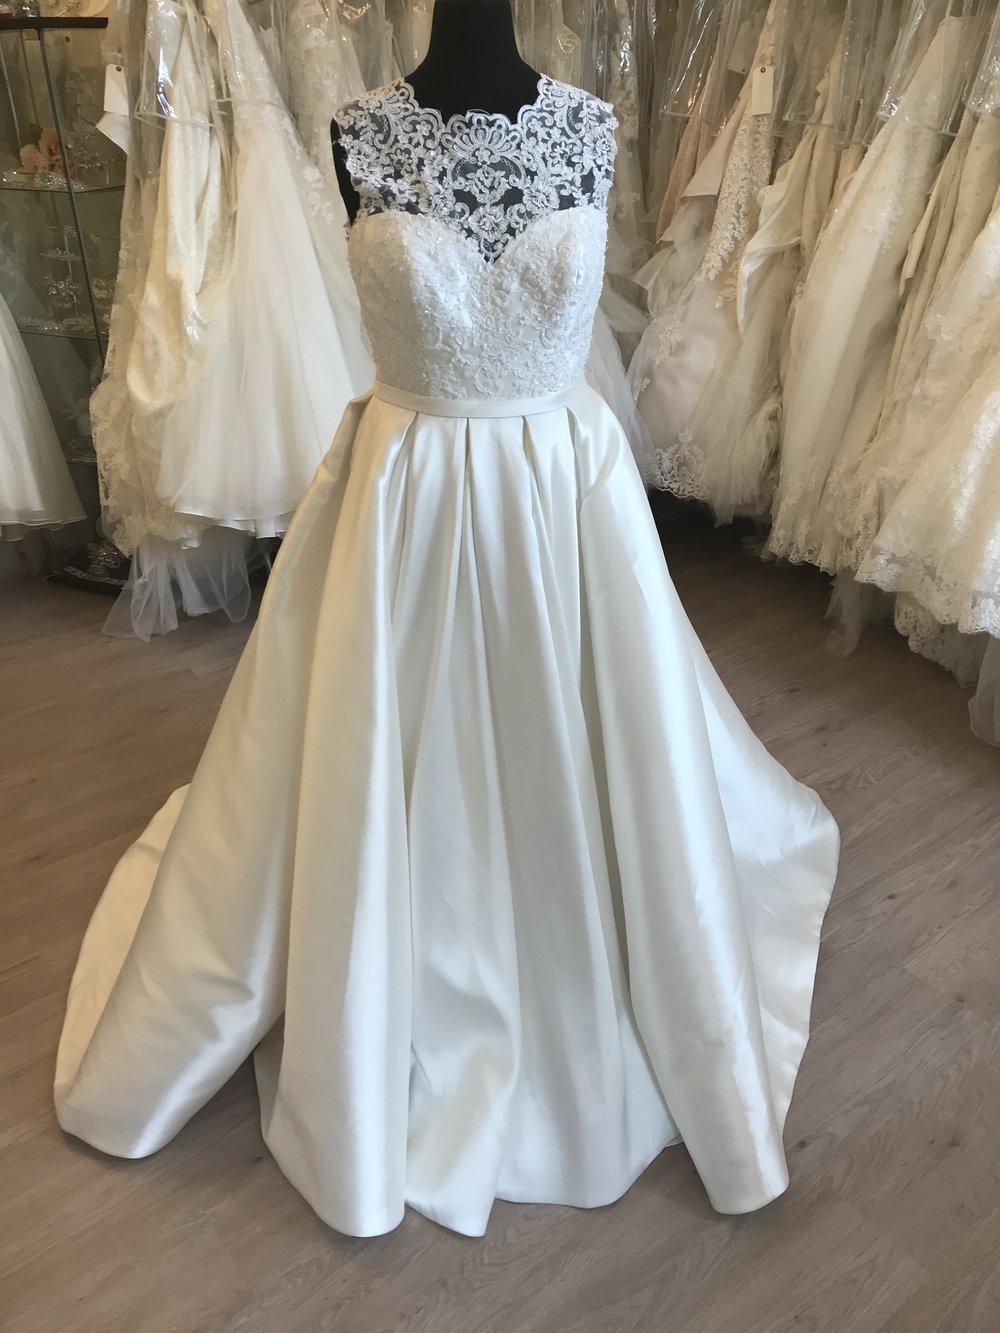 Phoenix Gowns 15092 NEW SAMPLE size 16 — Bliss Studio